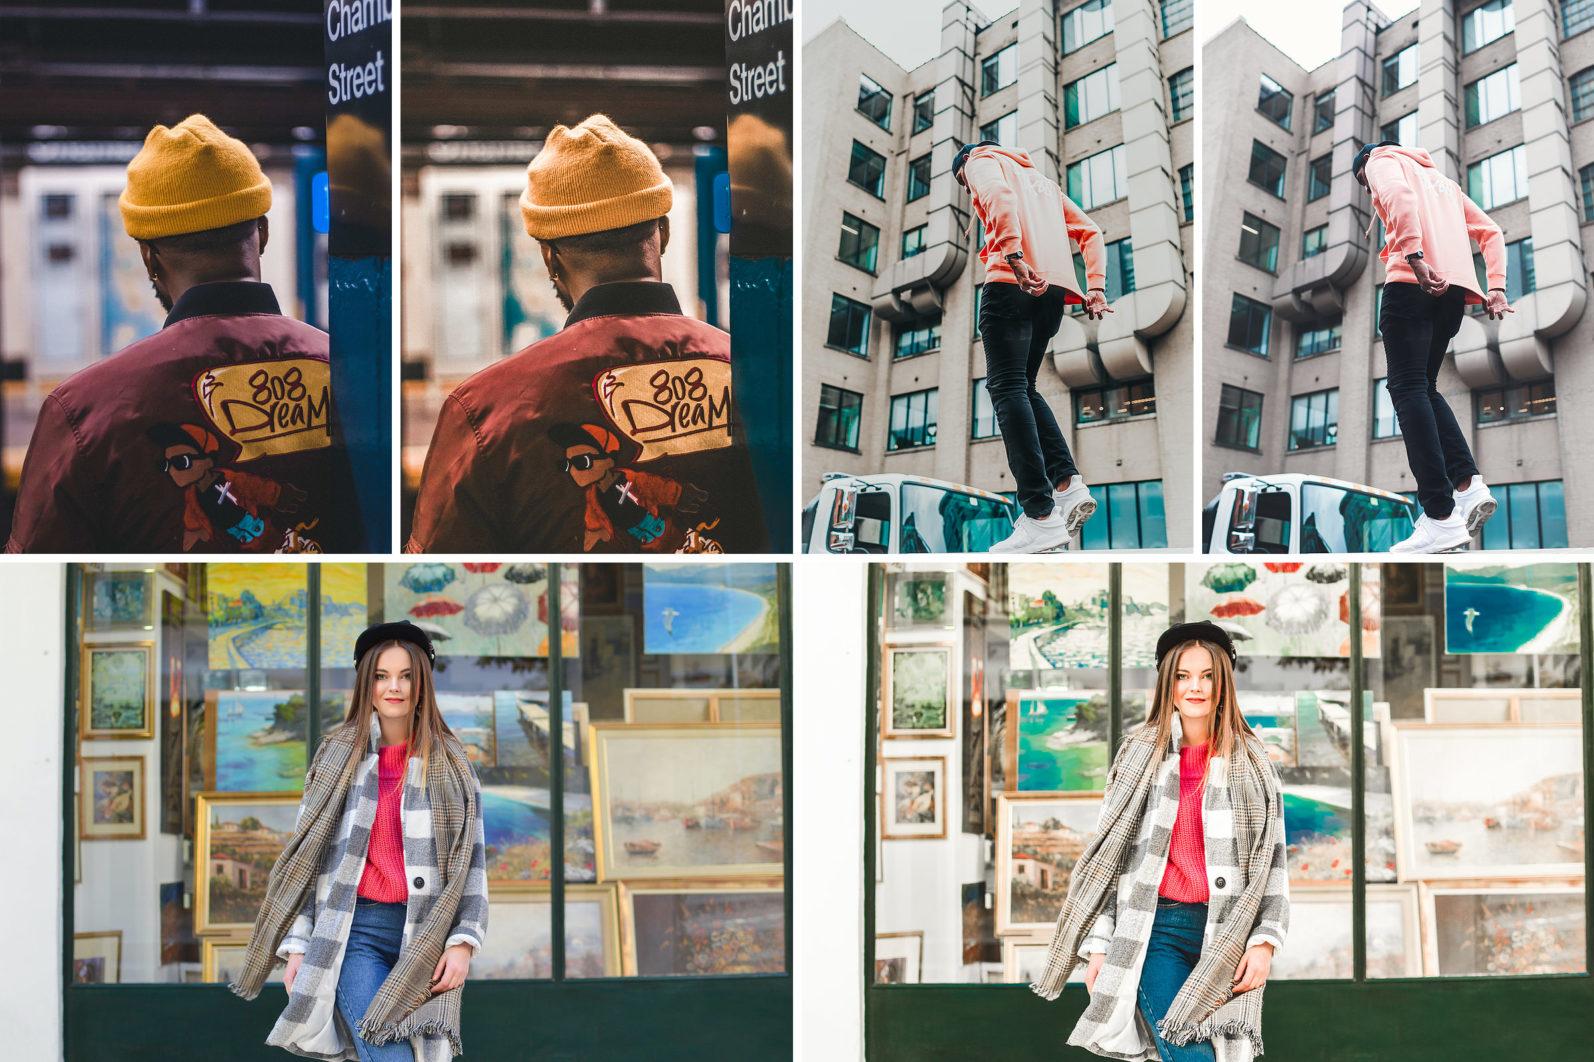 39. Street Fashion - 39.STREETFASHION 7 -